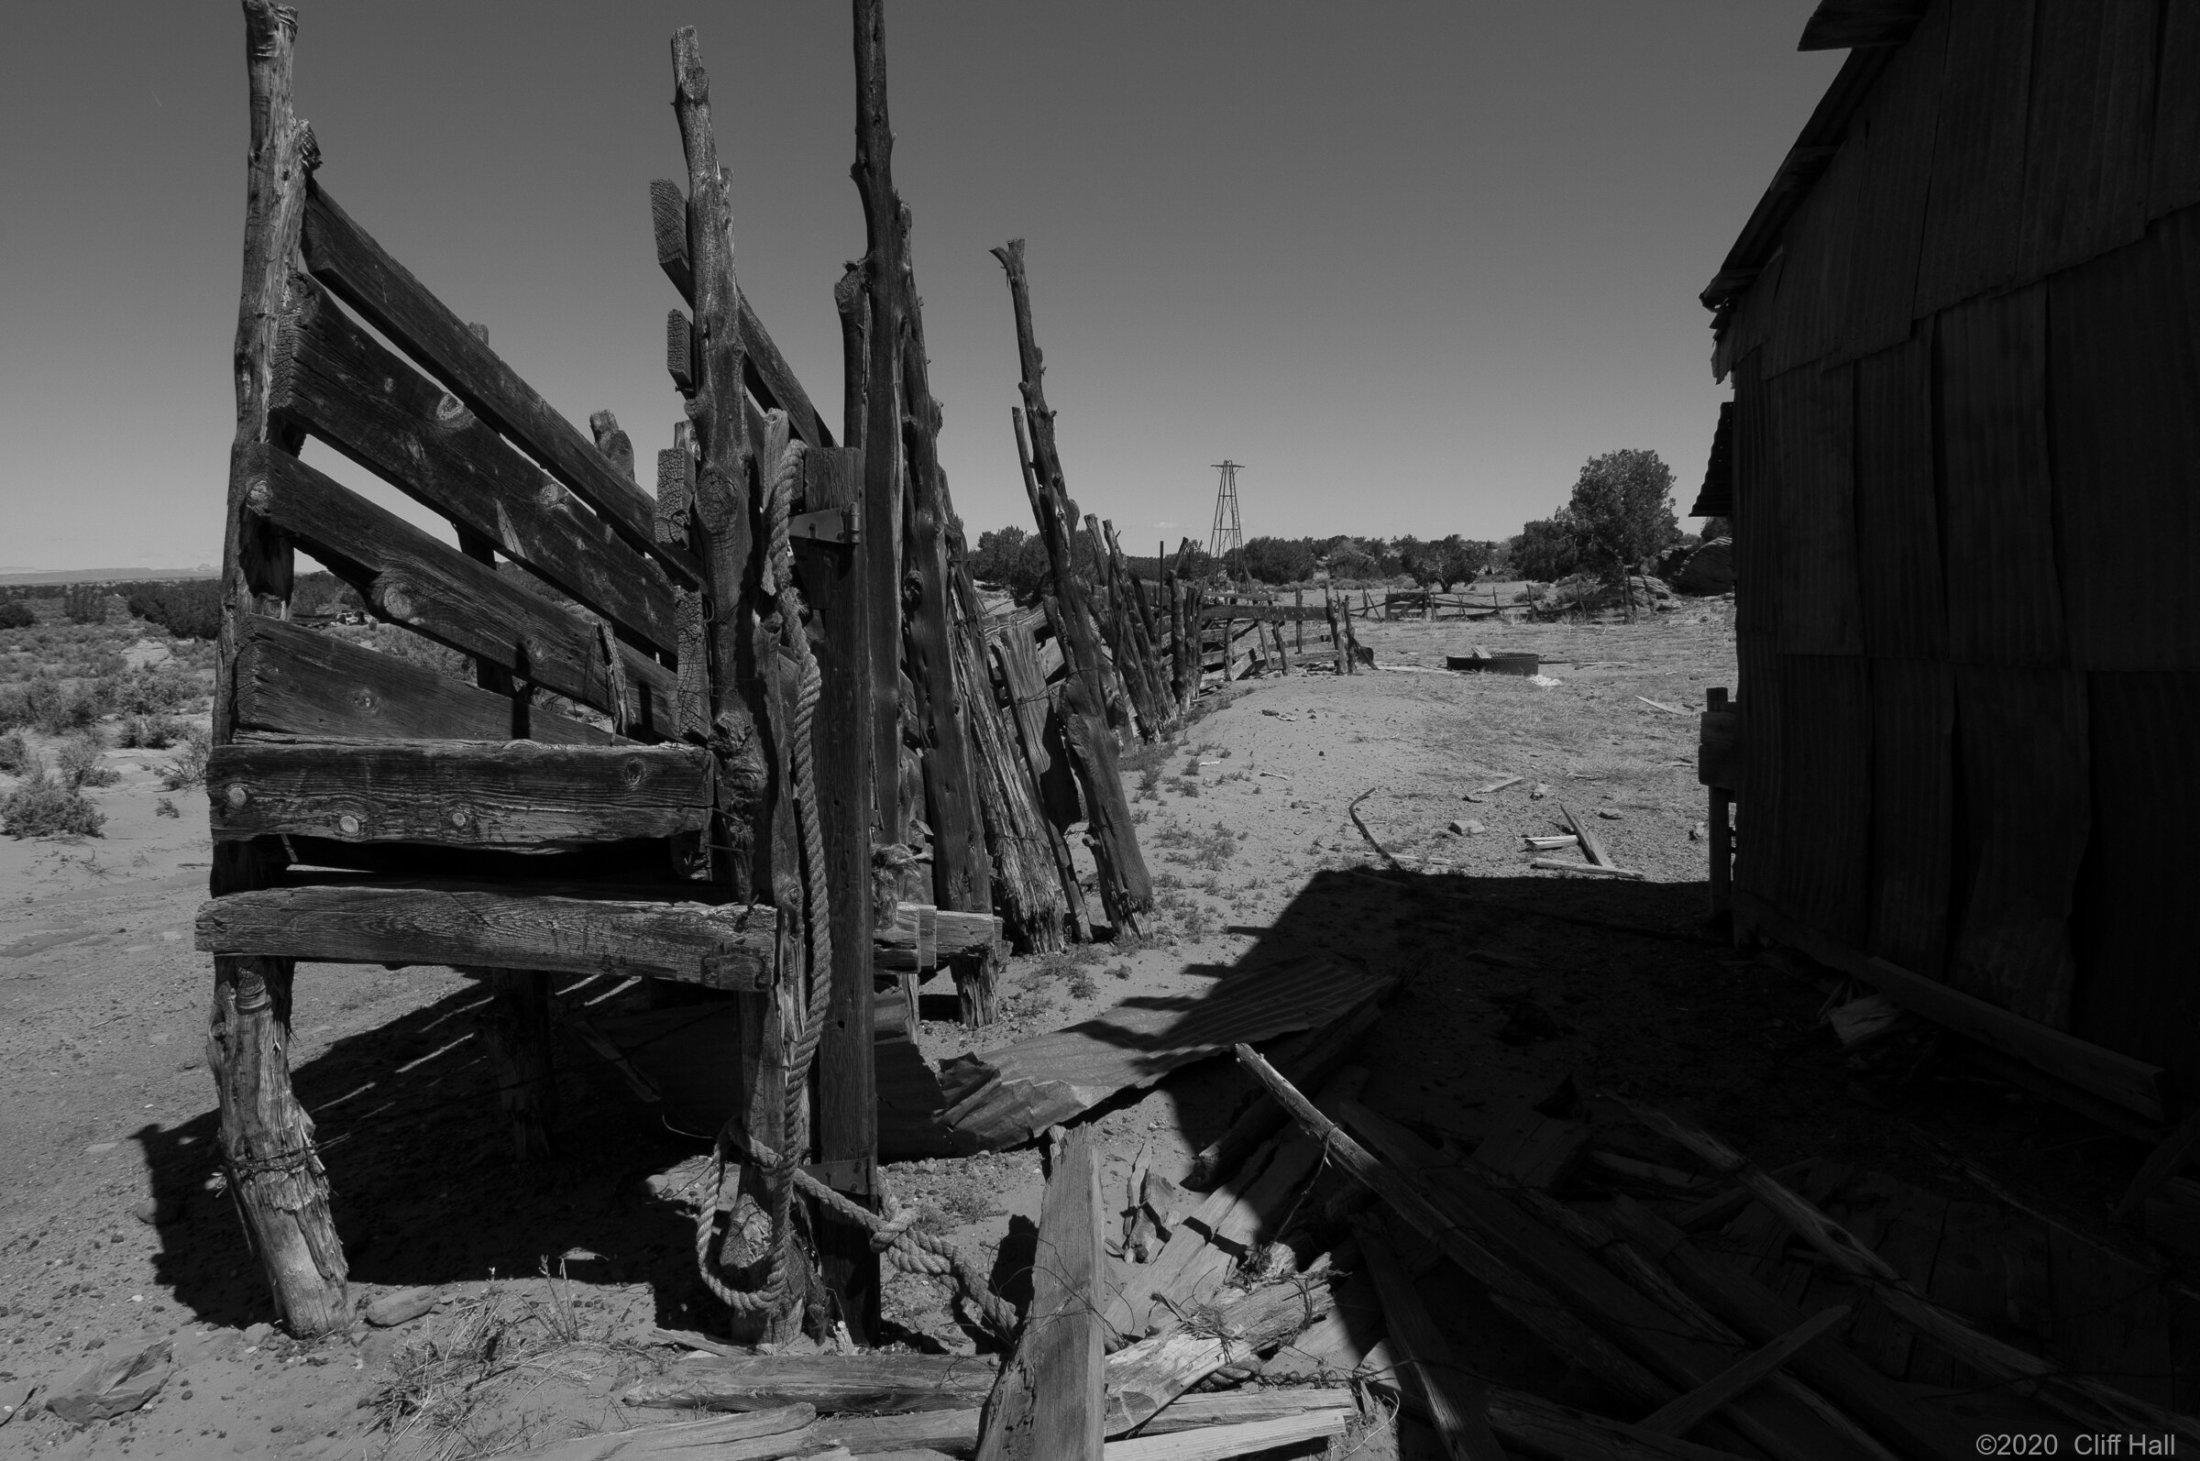 Cattle chute, Poverty Flat Ranch, AZ